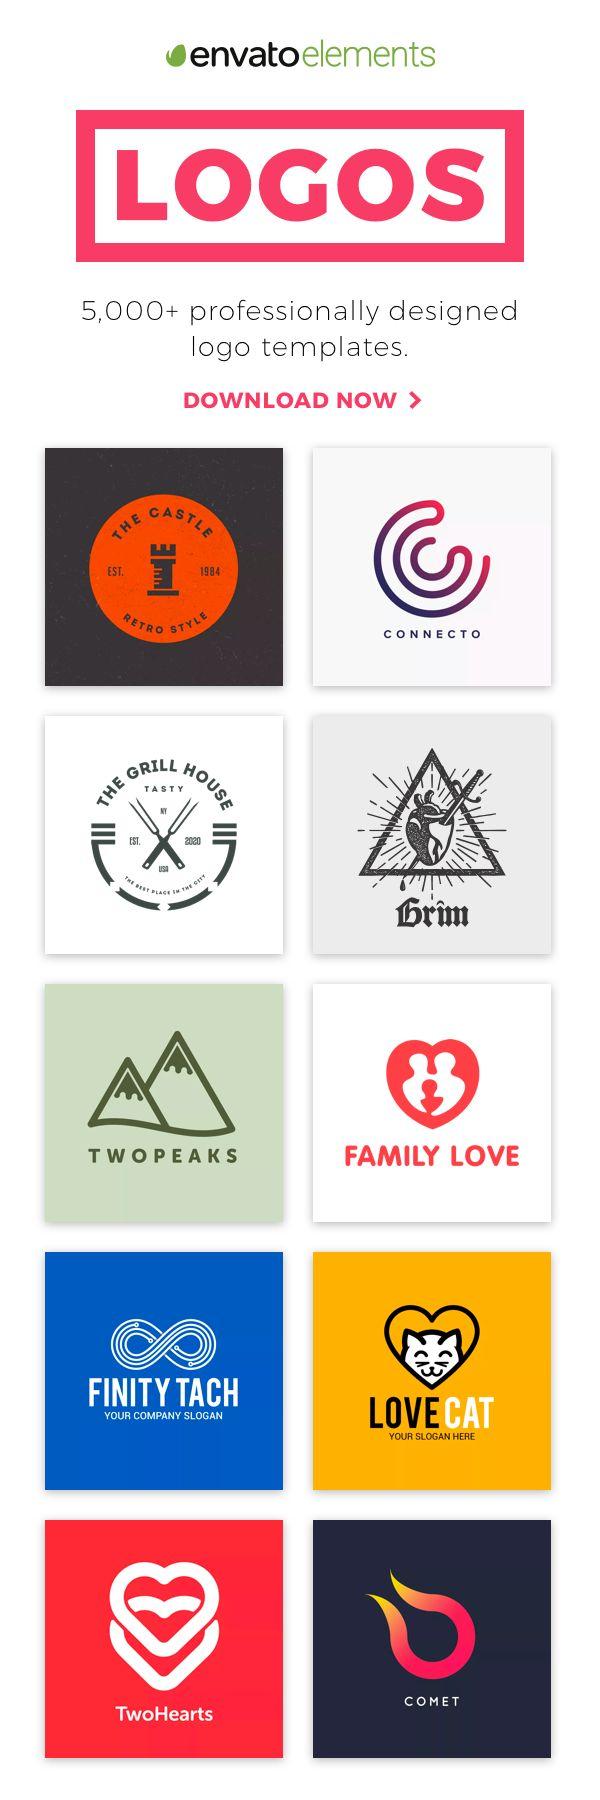 Unlimited Downloads of 2018's Best Logo Designs